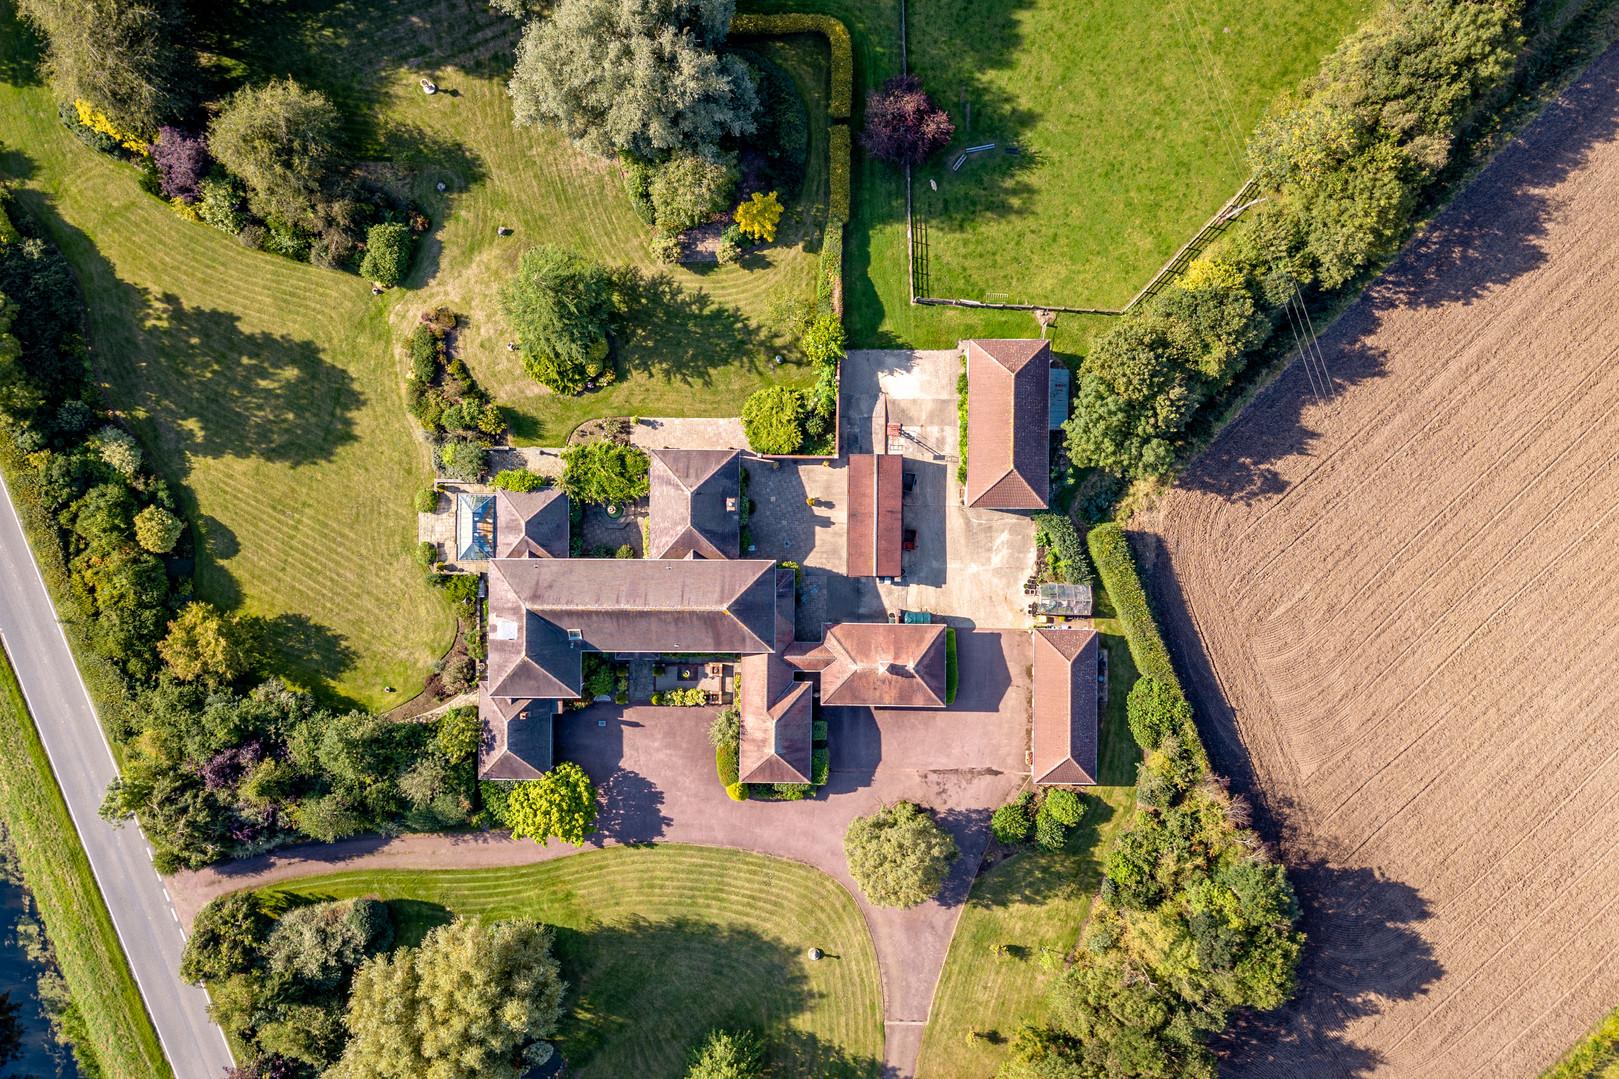 Holland House (Antons Gowt) Aerial-5.jpg